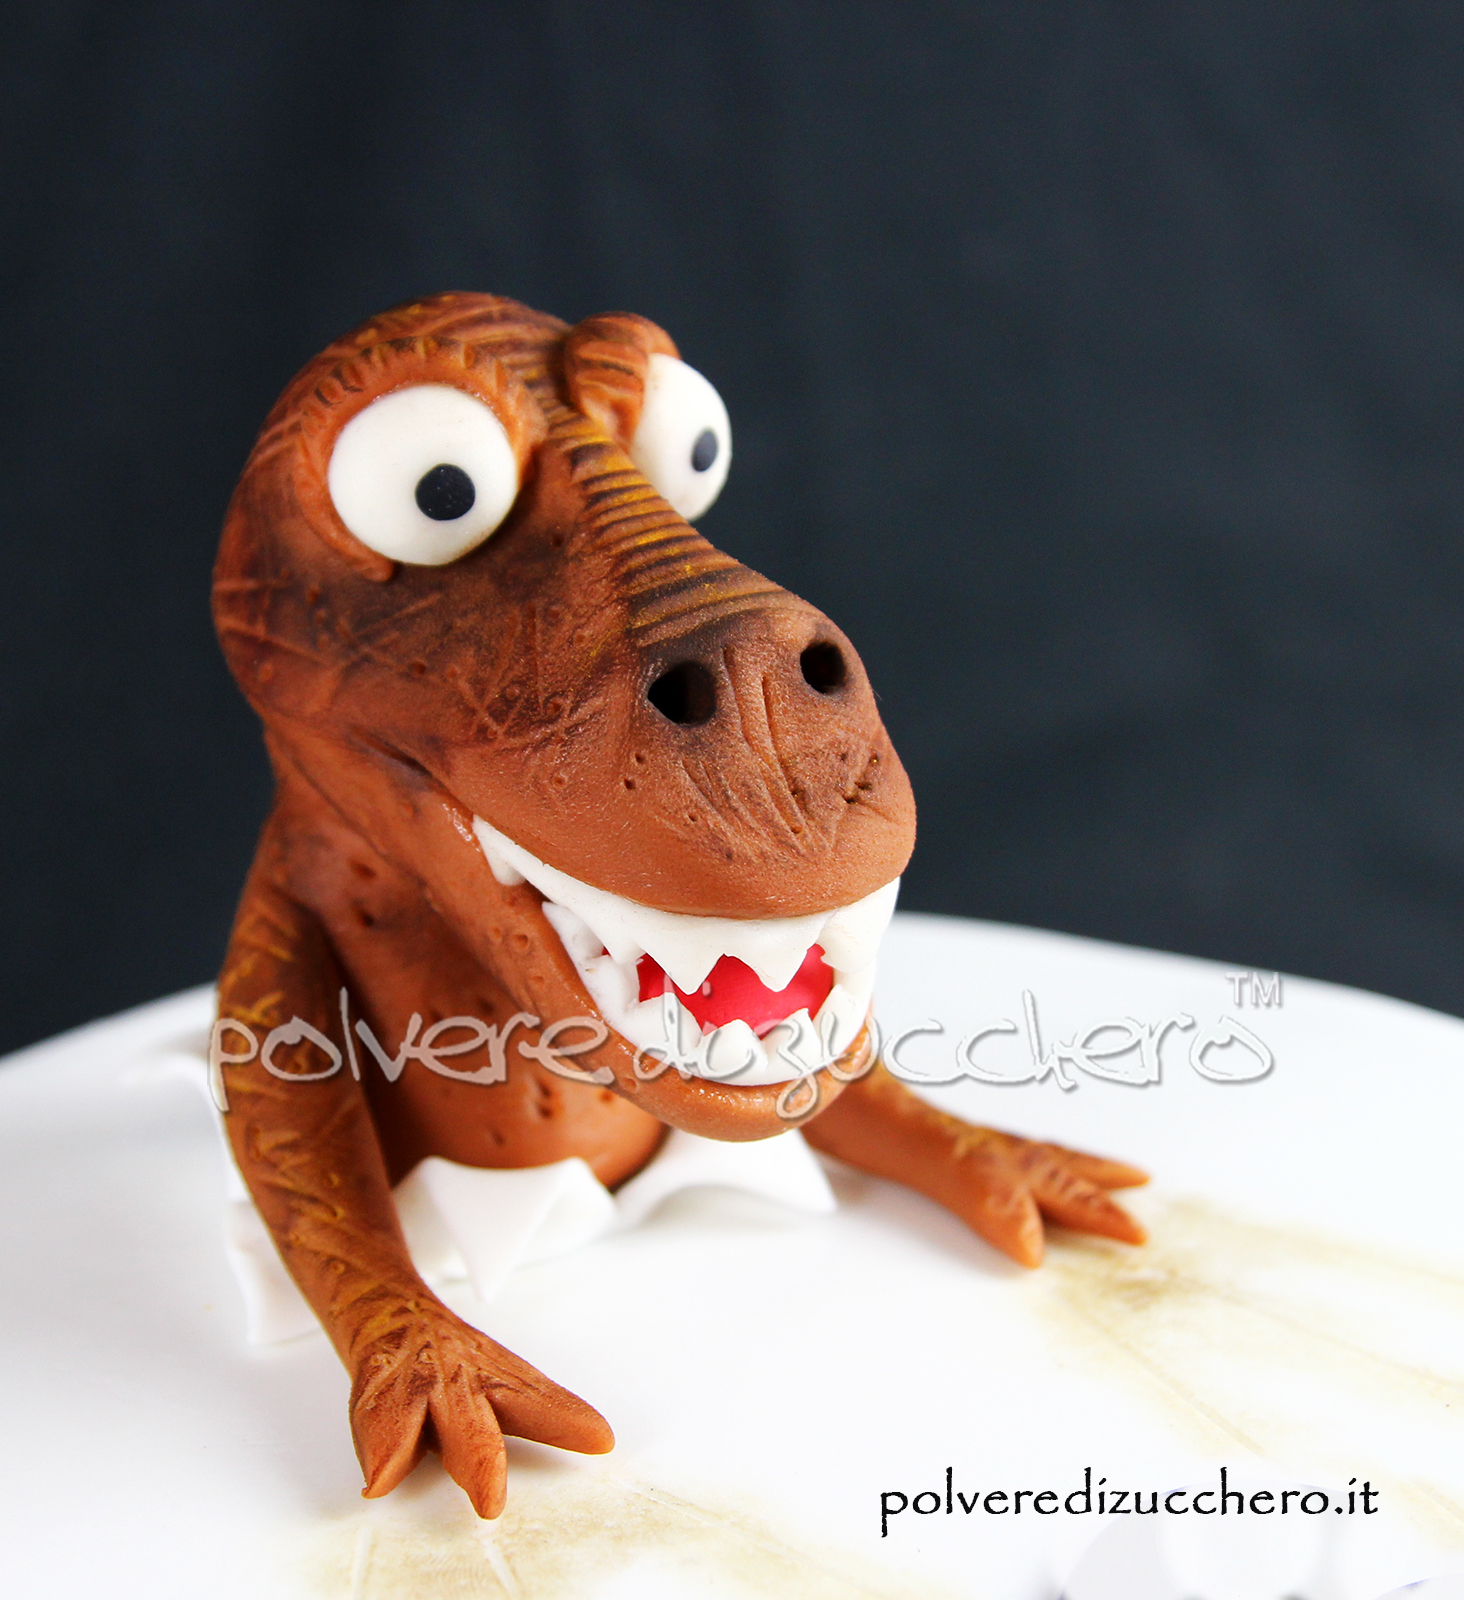 cake design pasta di zucchero polvere di zucchero torta decorata jurassic park jurassic world dinosauro dinosaur fondant compleanno bday